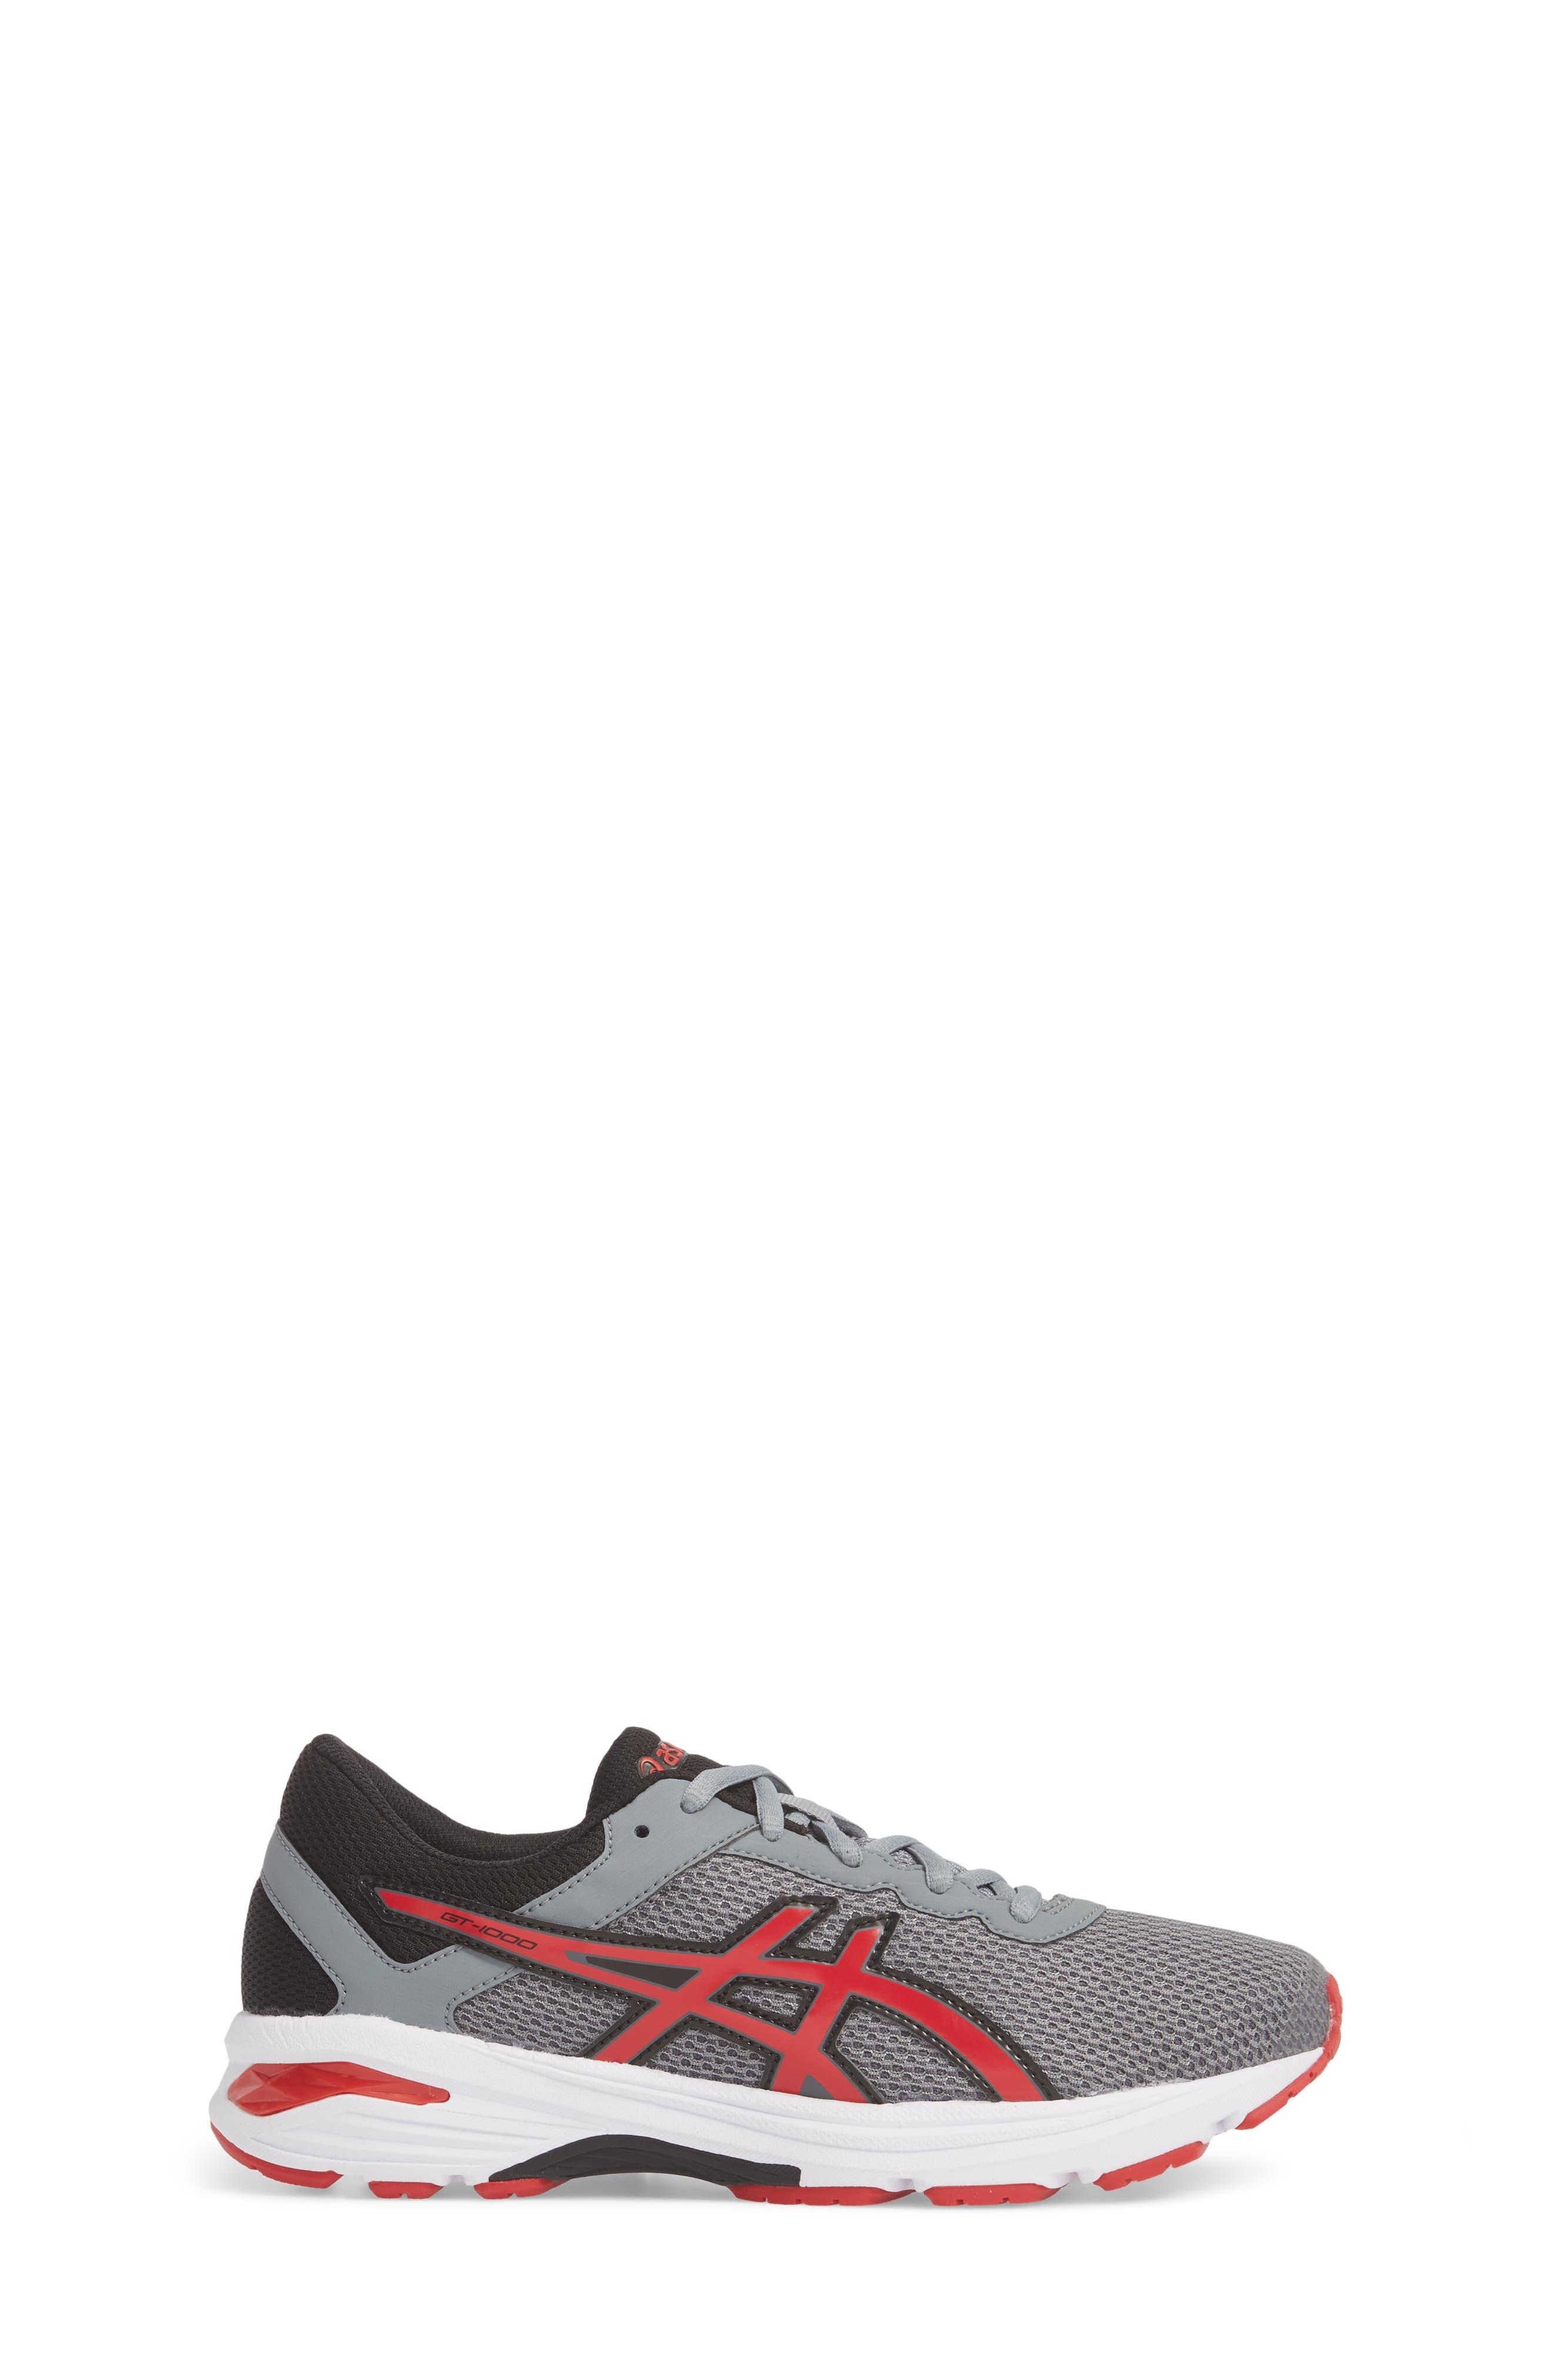 Asics GT-1000<sup>™</sup> 6 GS Sneaker,                             Alternate thumbnail 3, color,                             023